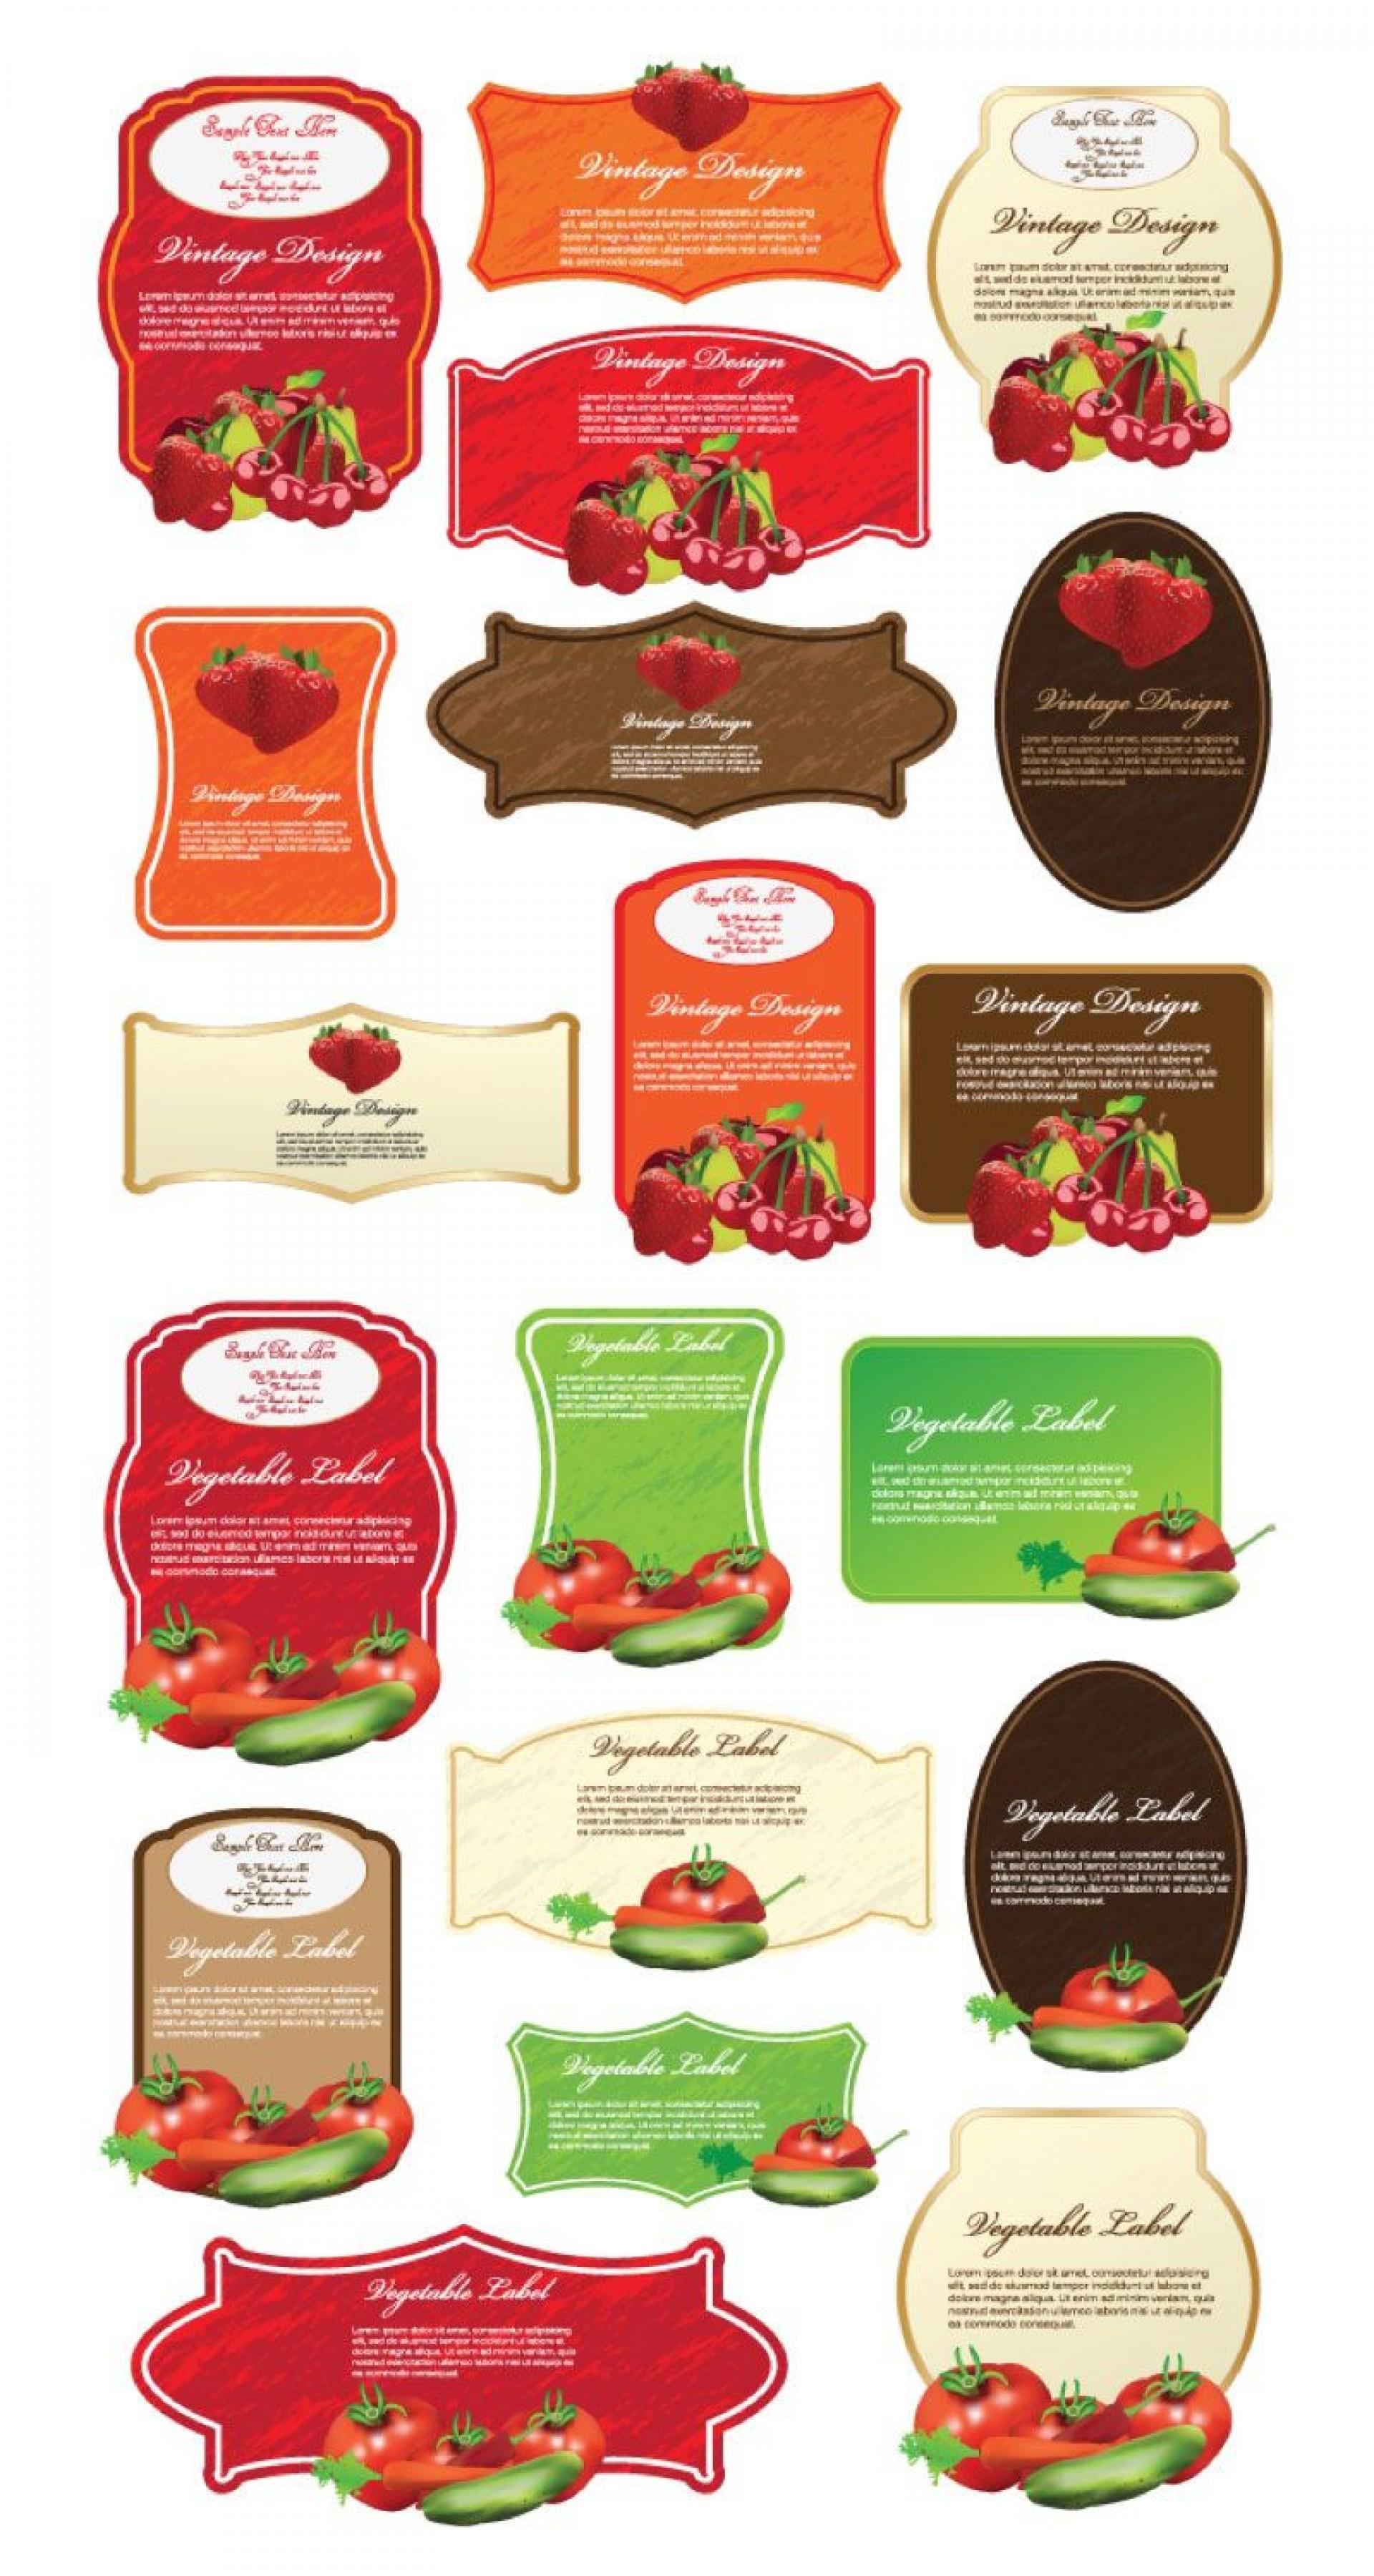 008 Unique Free Food Label Design Template Highest Quality  Templates Download1920